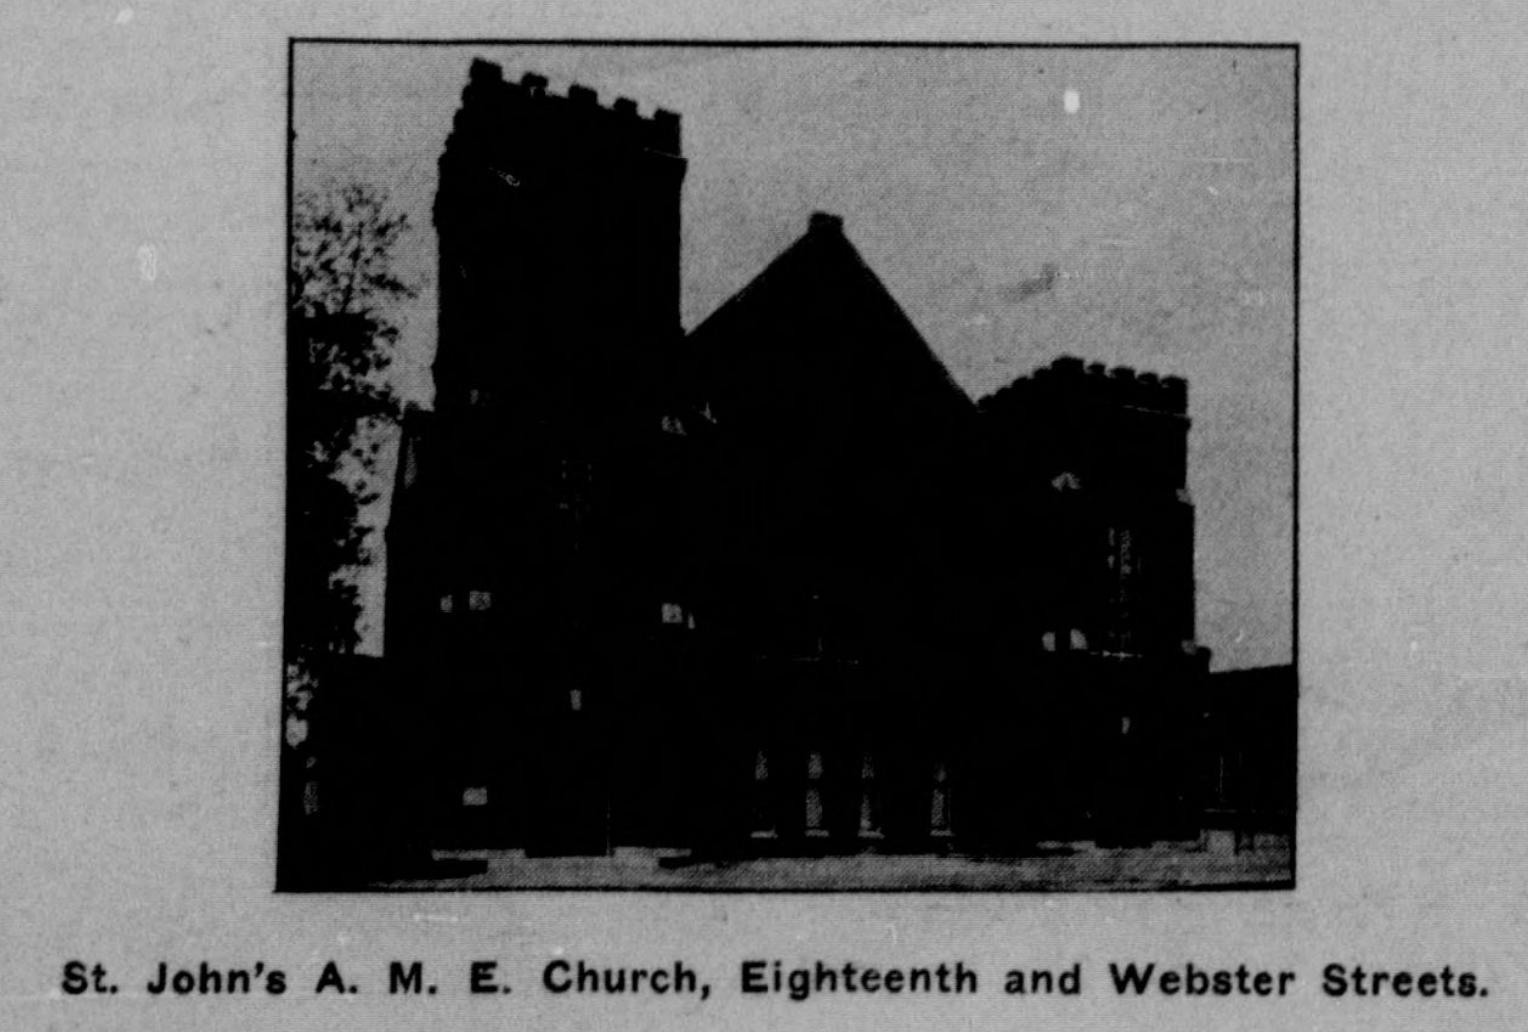 St. John's African Methodist Episcopal Church, 18th and Webster Streets, Omaha, Nebraska